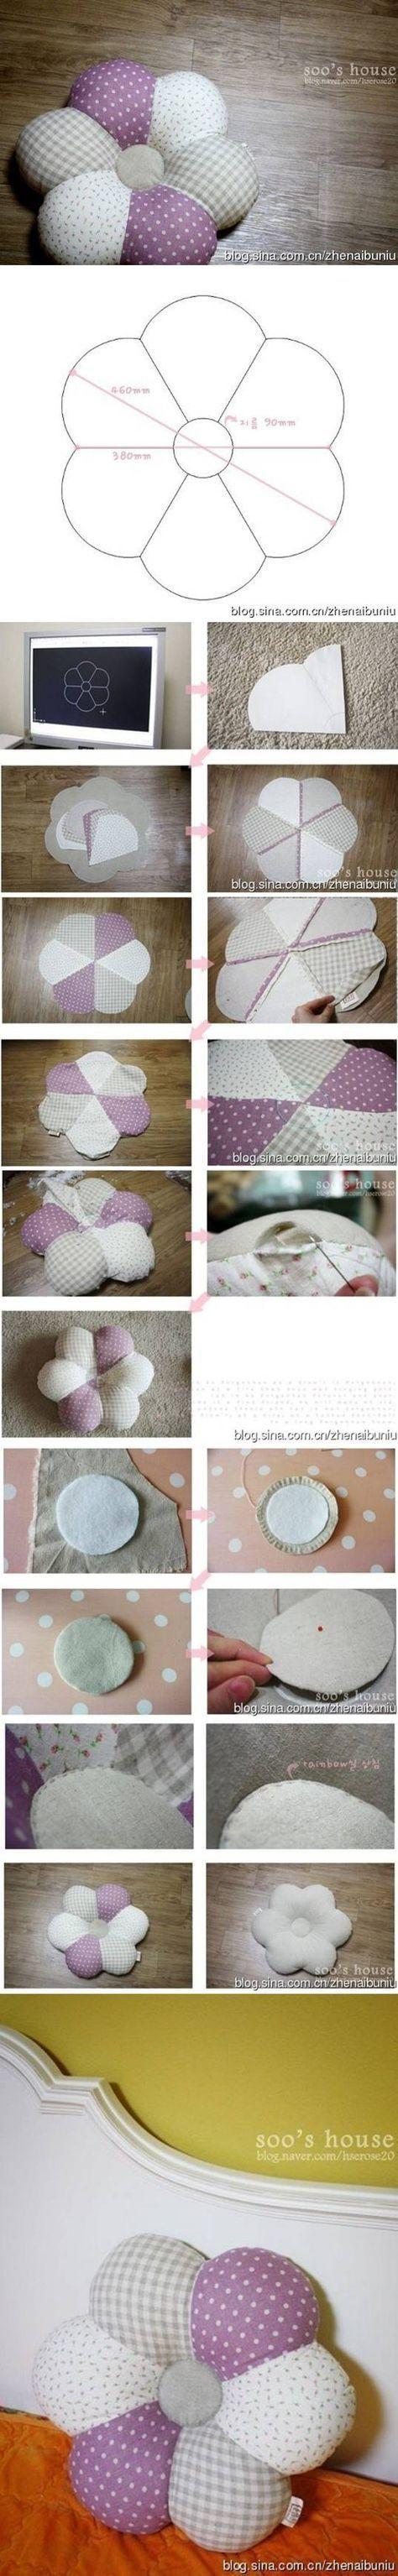 DIY Flower Style Pillow DIY Projects   UsefulDIY.com Follow Us on Facebook ==> http://www.facebook.com/UsefulDiy